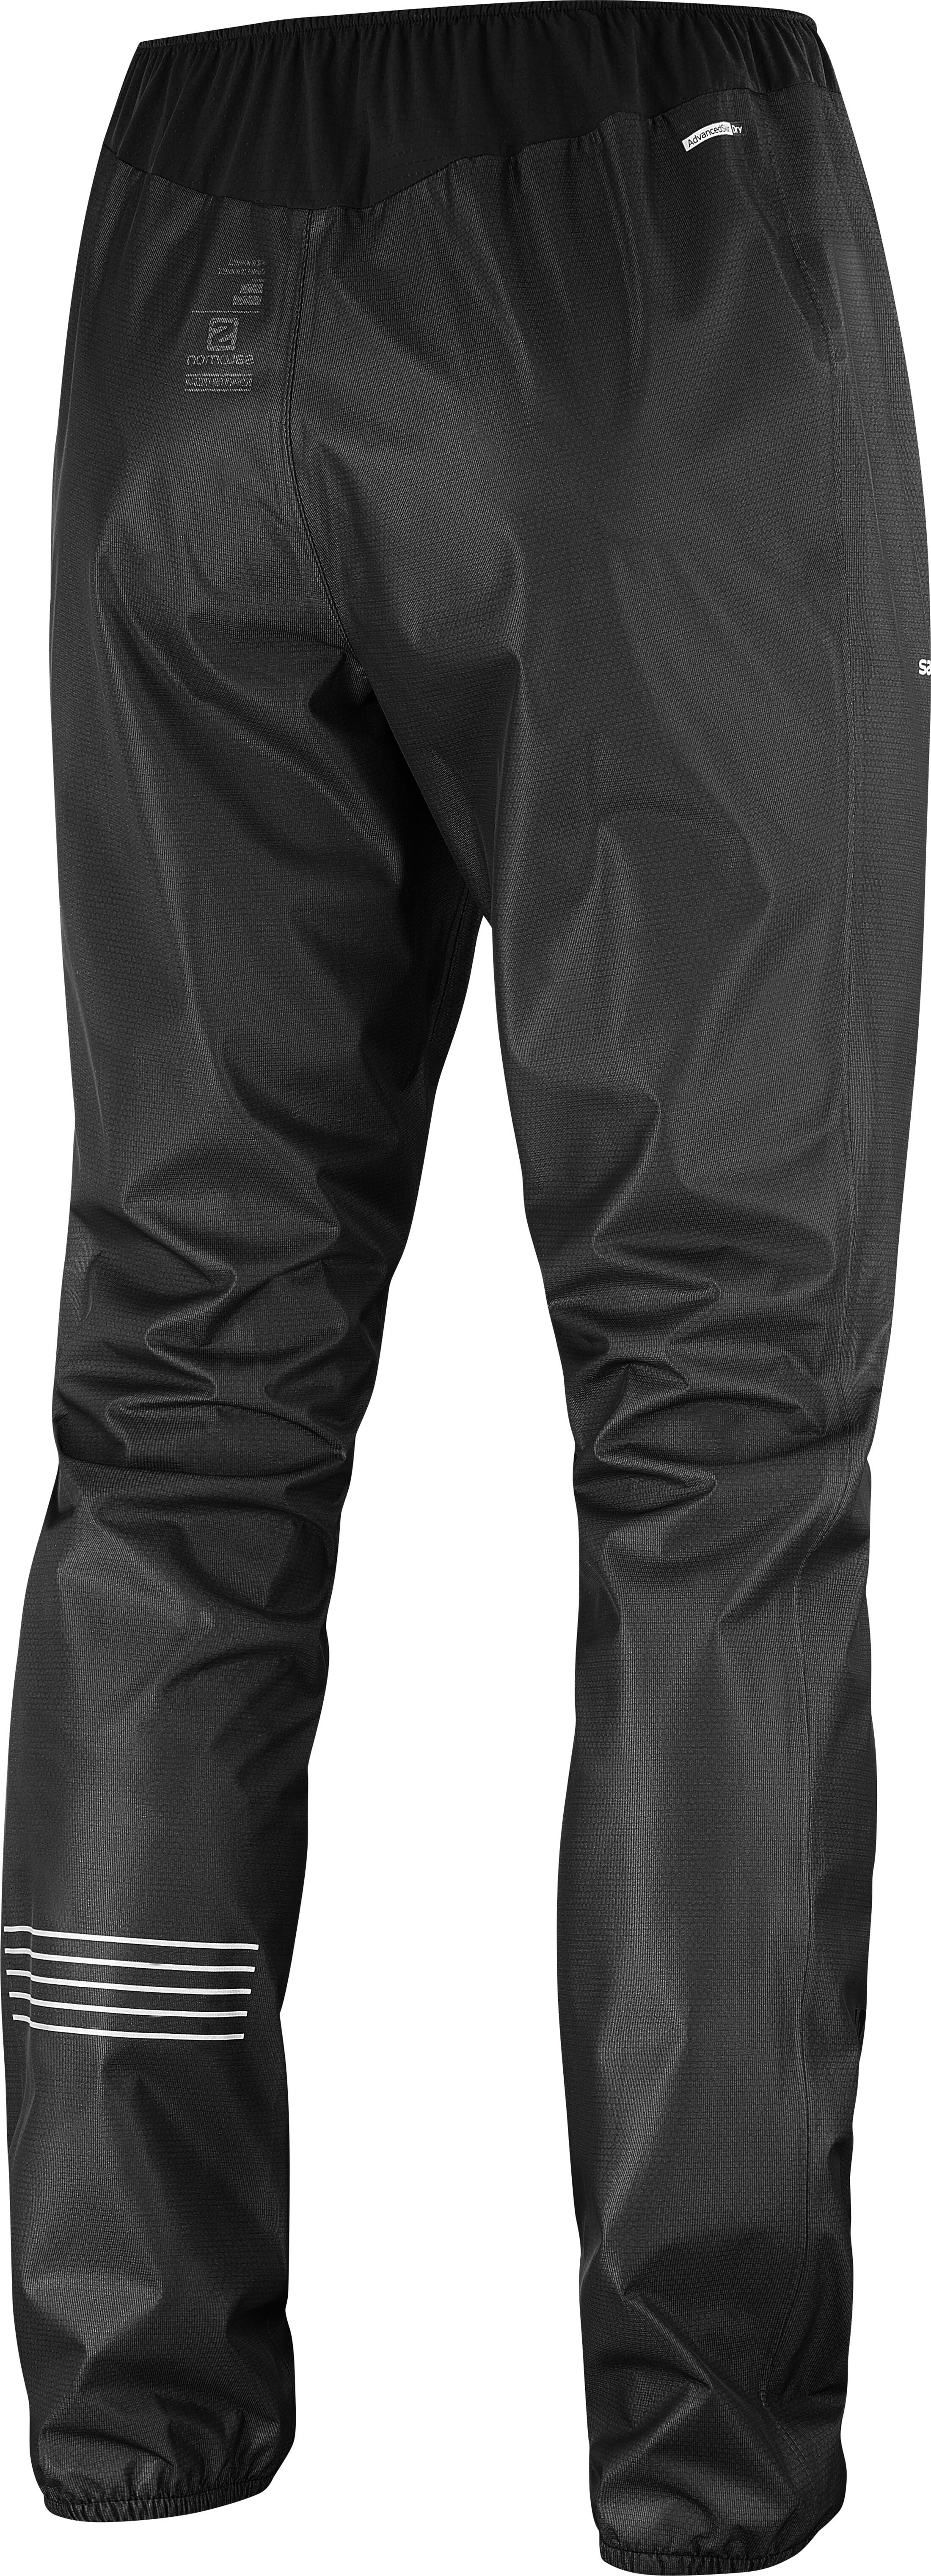 großer Rabatt klassischer Stil von 2019 diversifiziert in der Verpackung Salomon Bonatti Race WP Pants Men black